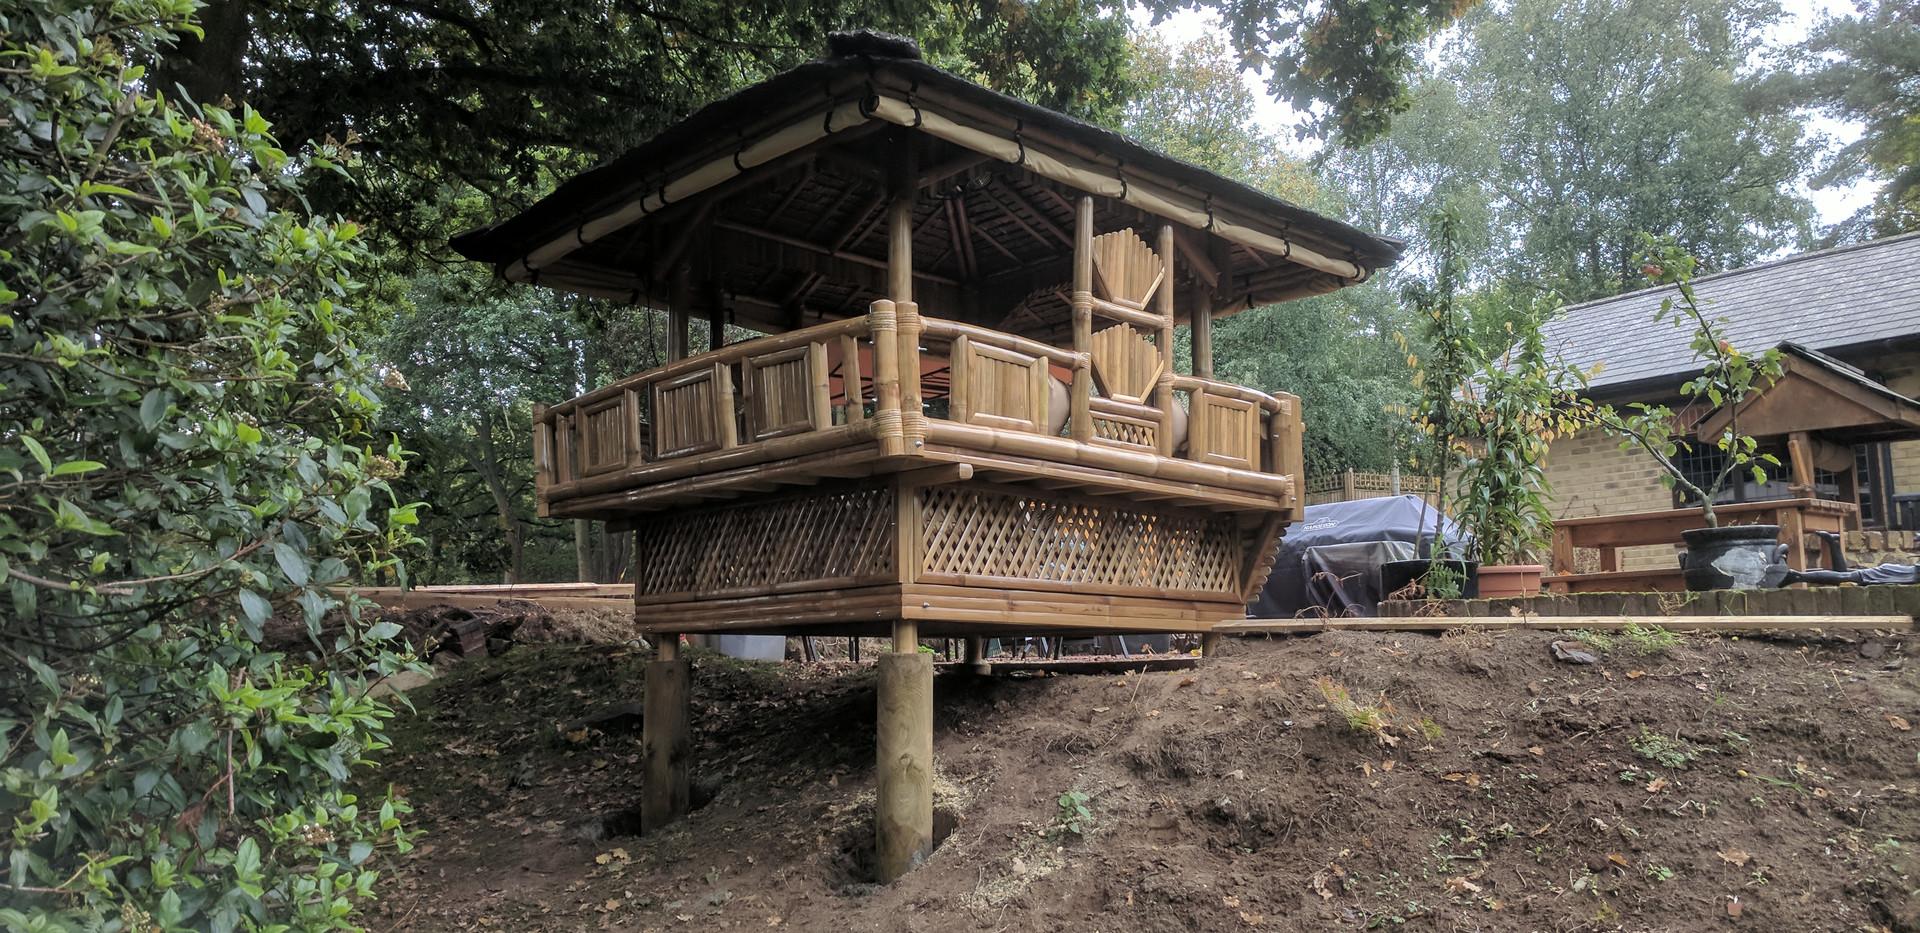 Bamboo gazebo placed on stilts